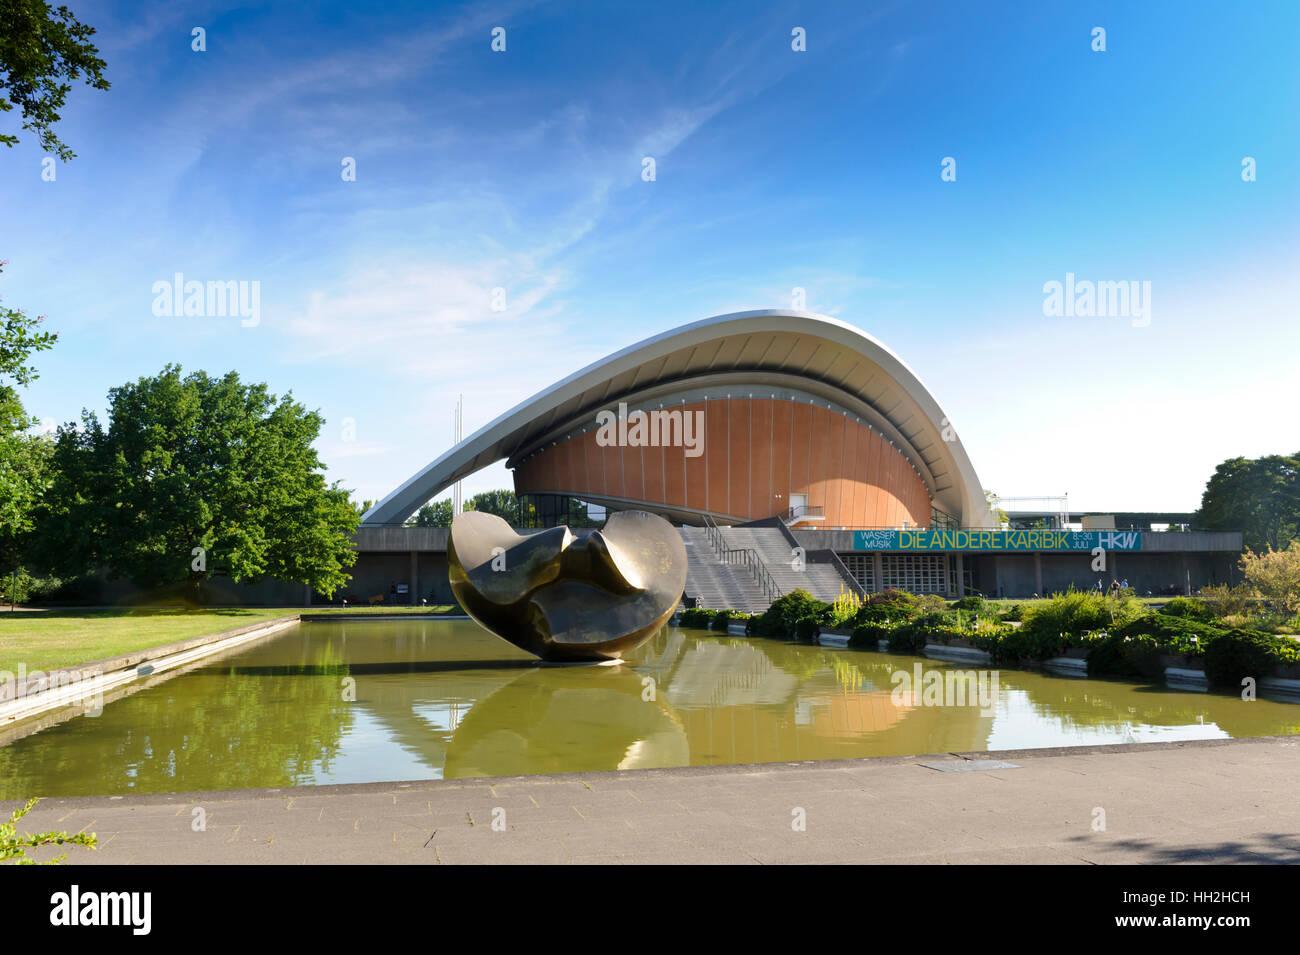 Haus der Kulturen der Welt, House of World Cultures, Berlin, Germany. - Stock Image